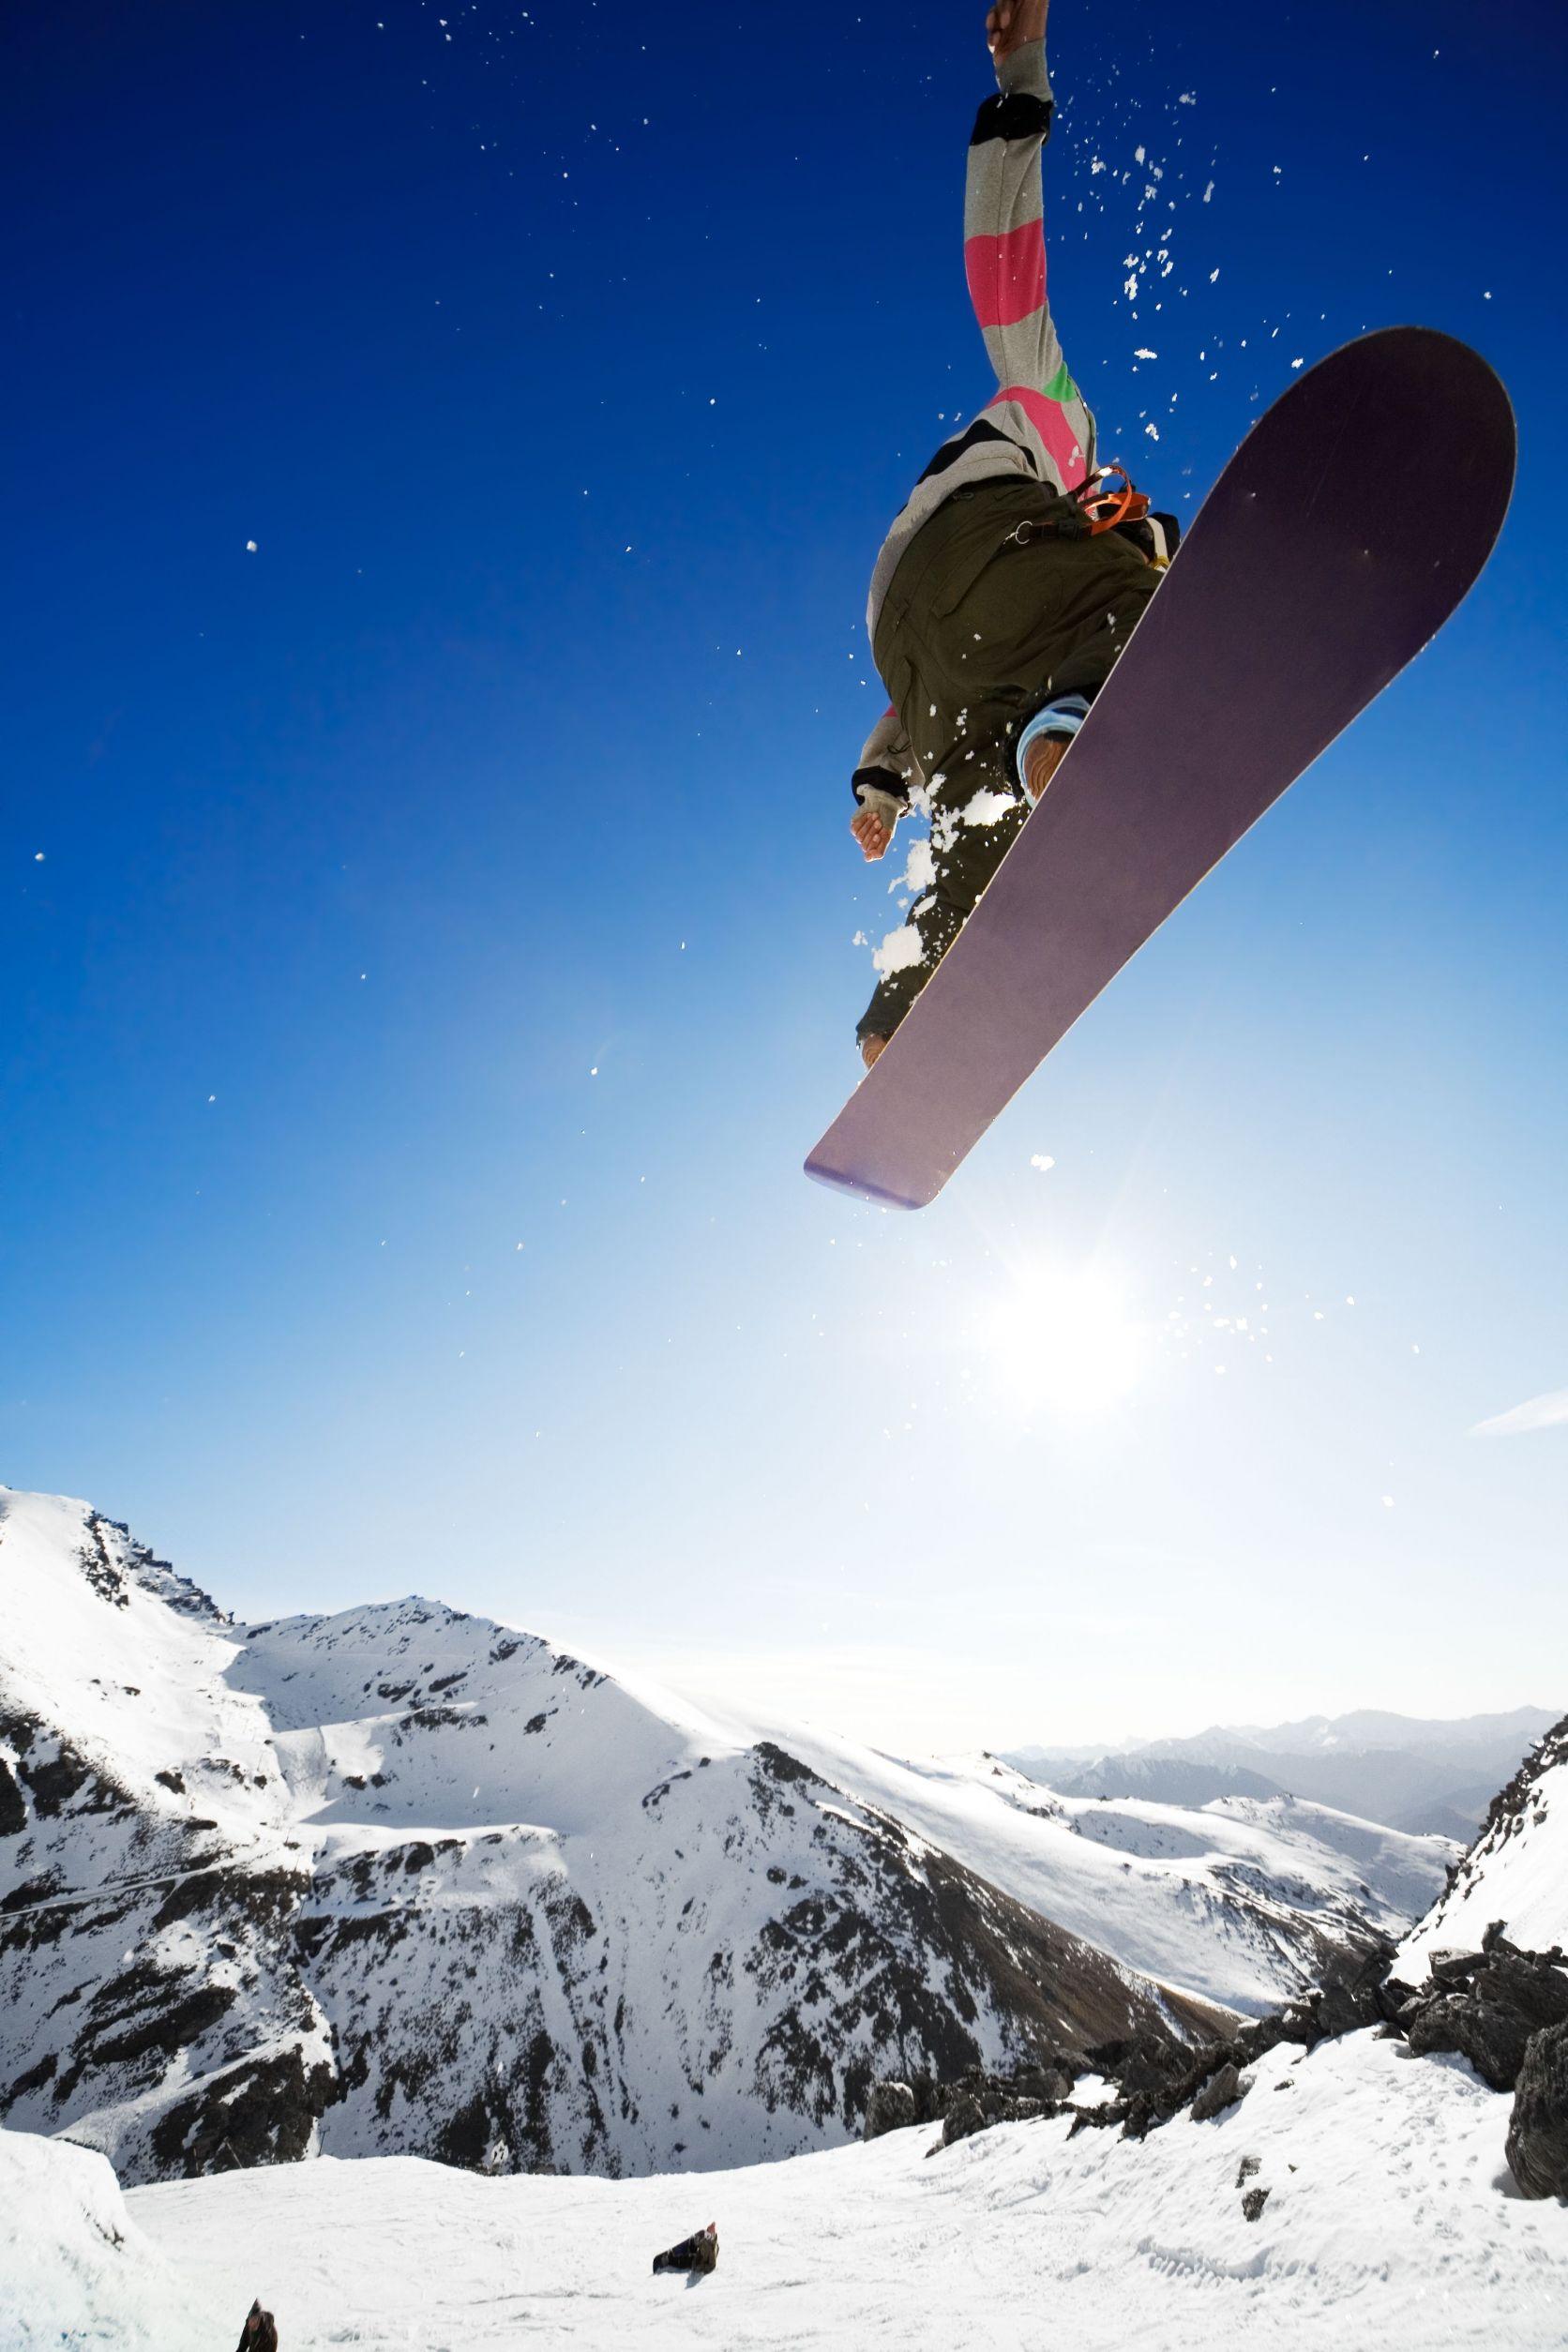 snowboard-jump-australia